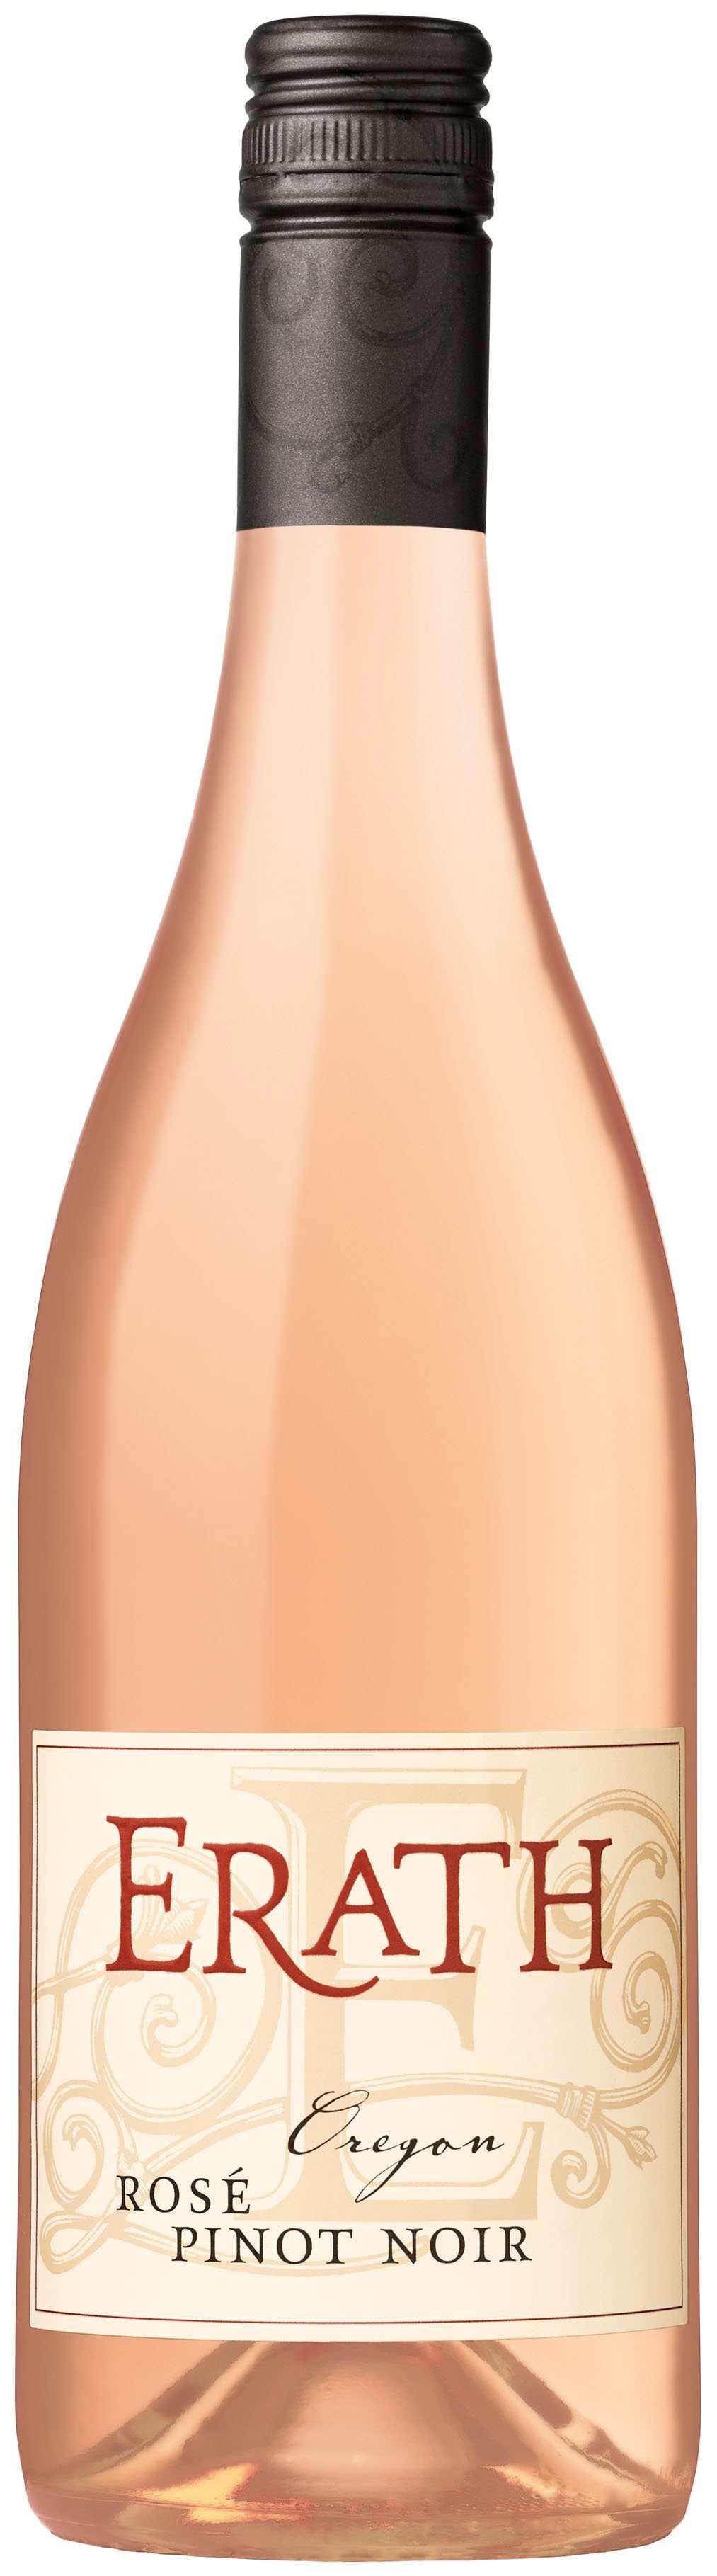 Erath 2018 Oregon Rosé of Pinot Noir